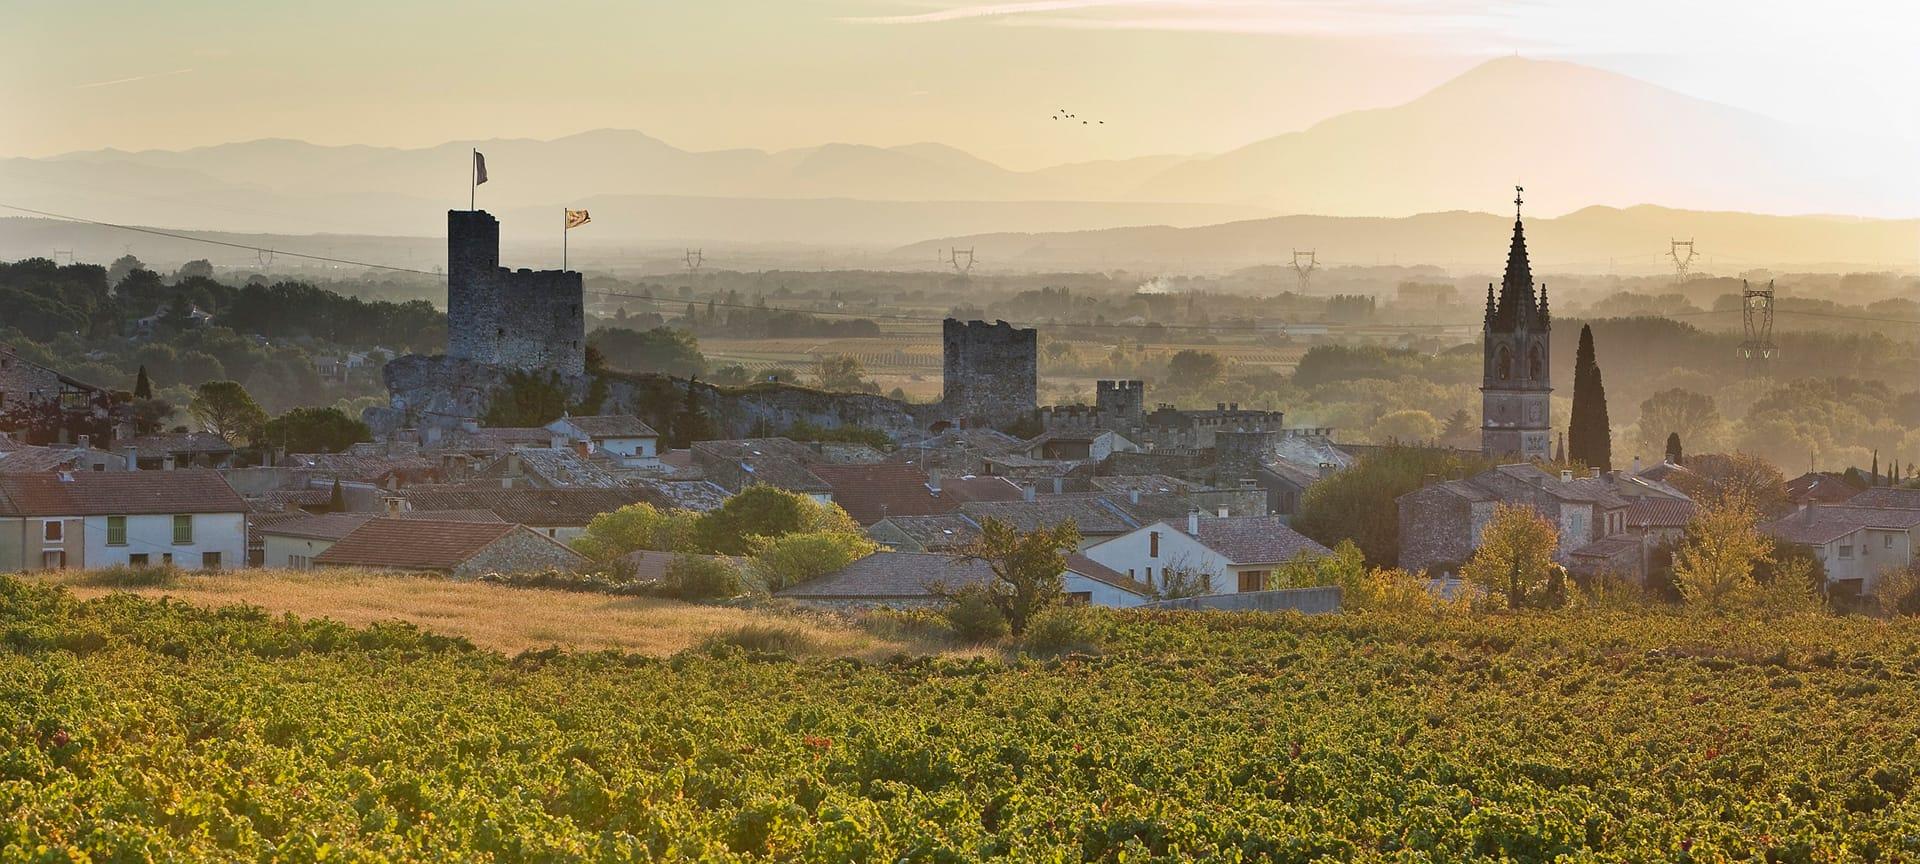 Côtes du Vivarais